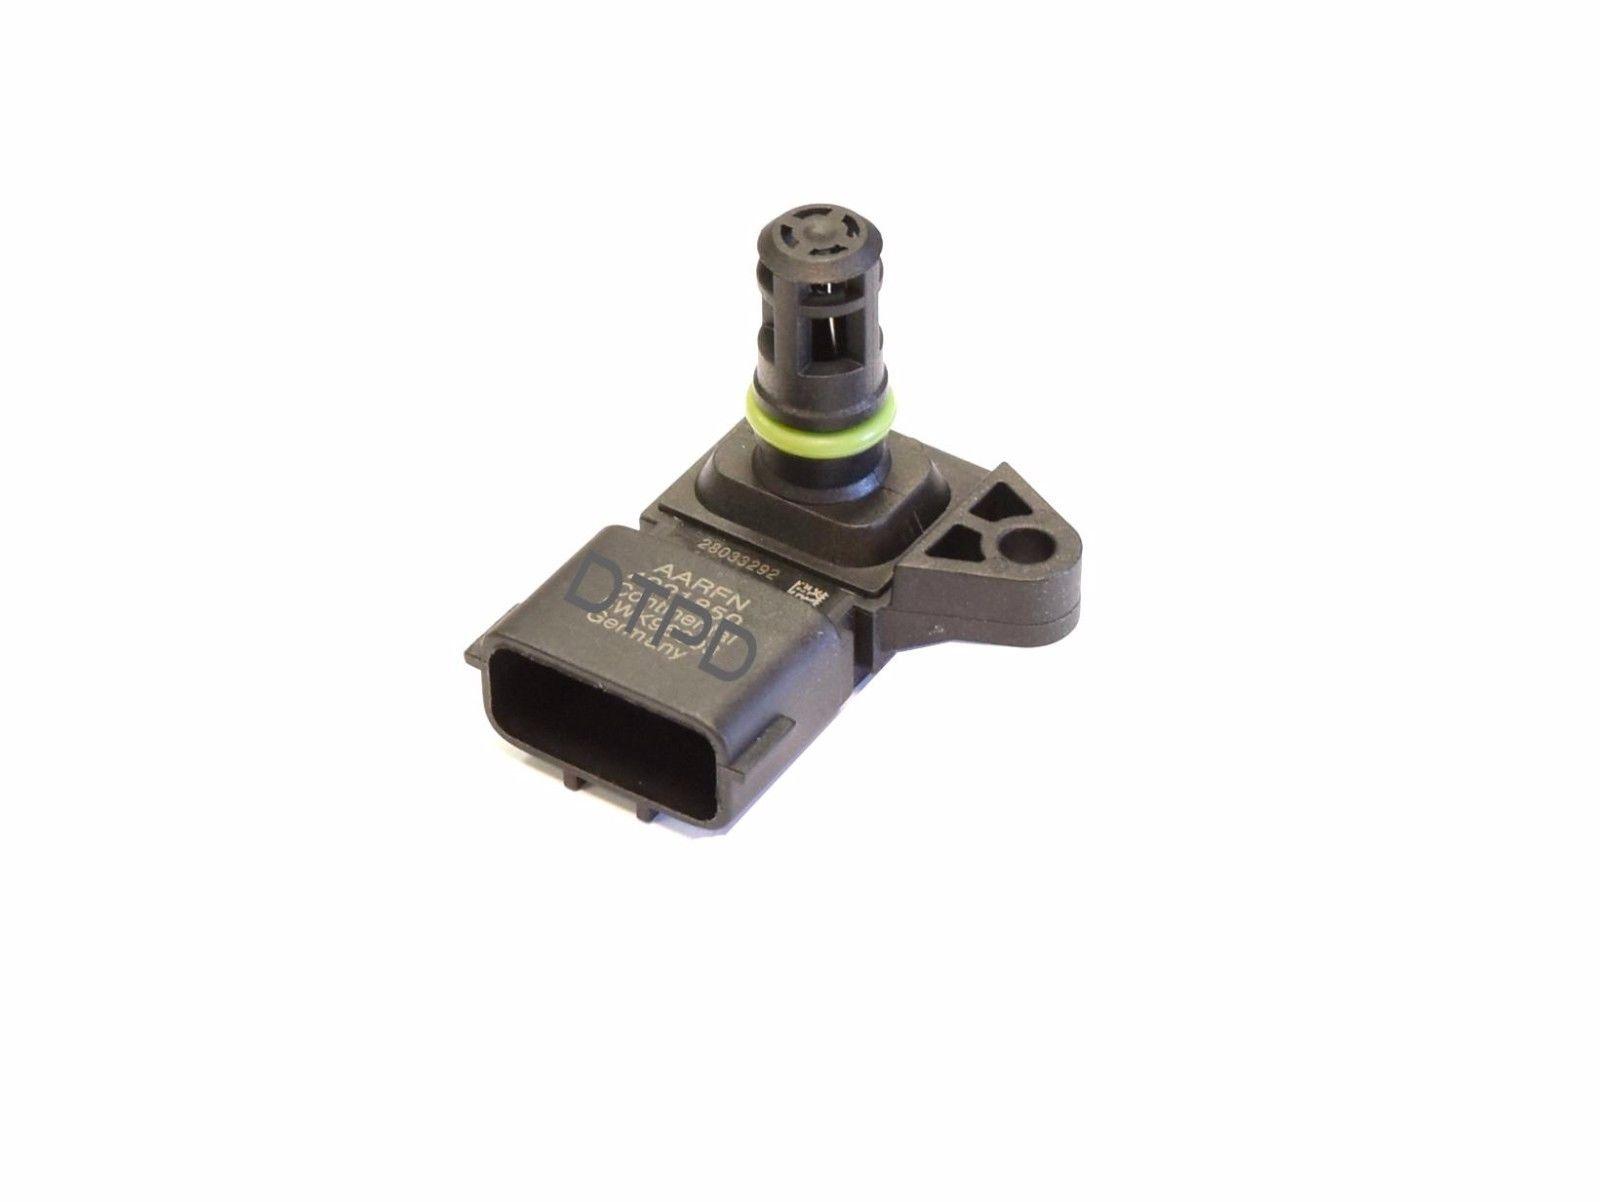 SPOOLOGIC Air Intake Sensor for 07-16 6.7L Cummins 24V